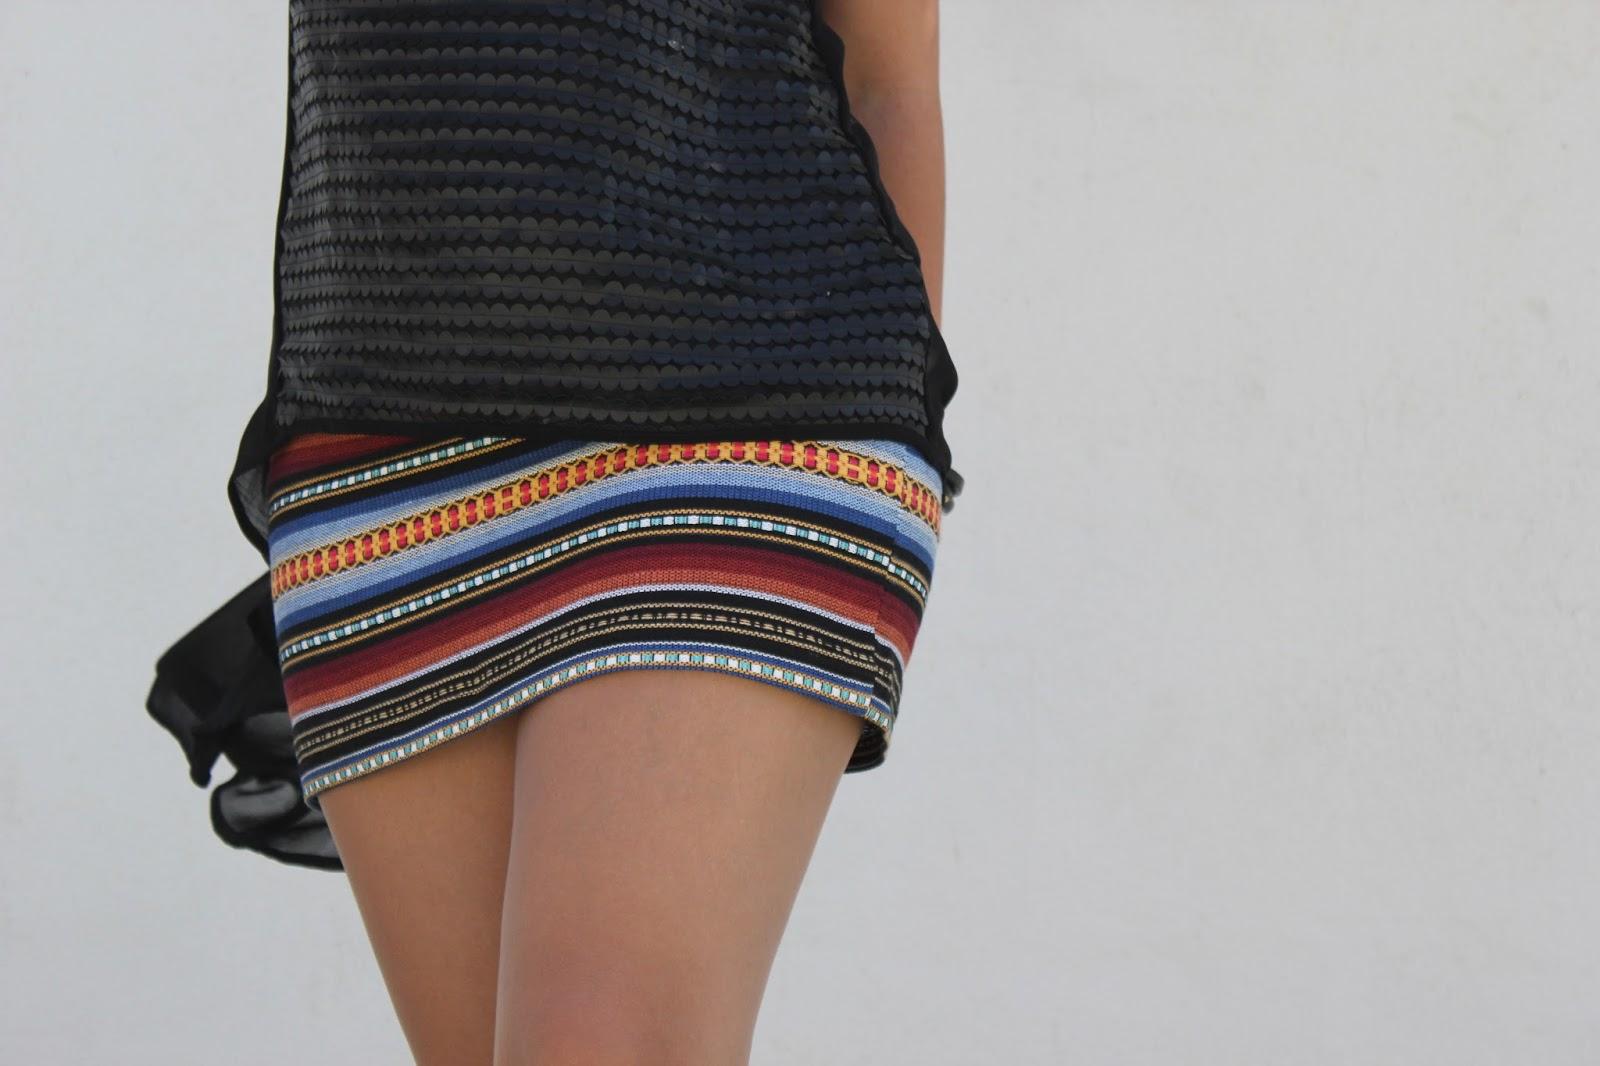 Costura fácil: mini falda étnica DIY (patrón gratis) - Handbox Craft ...